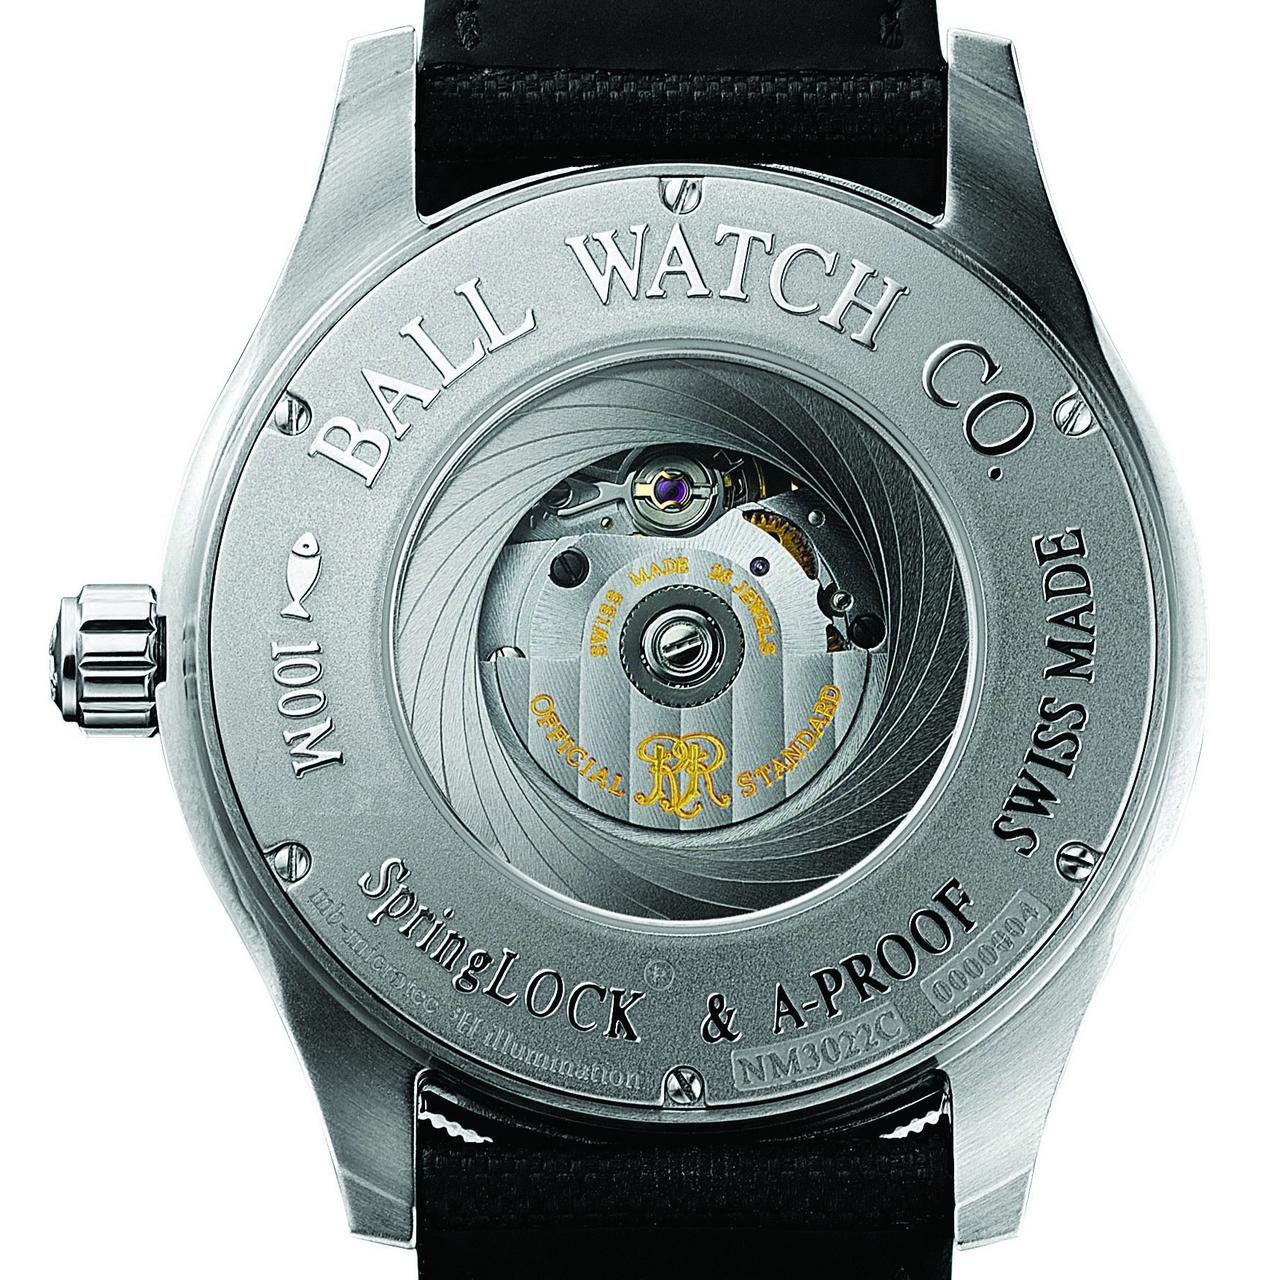 anteprima-baselworld-2015-ball-watch-engineer-ii-magneto-s-nm3022c-n1cj-bk_0-100_2